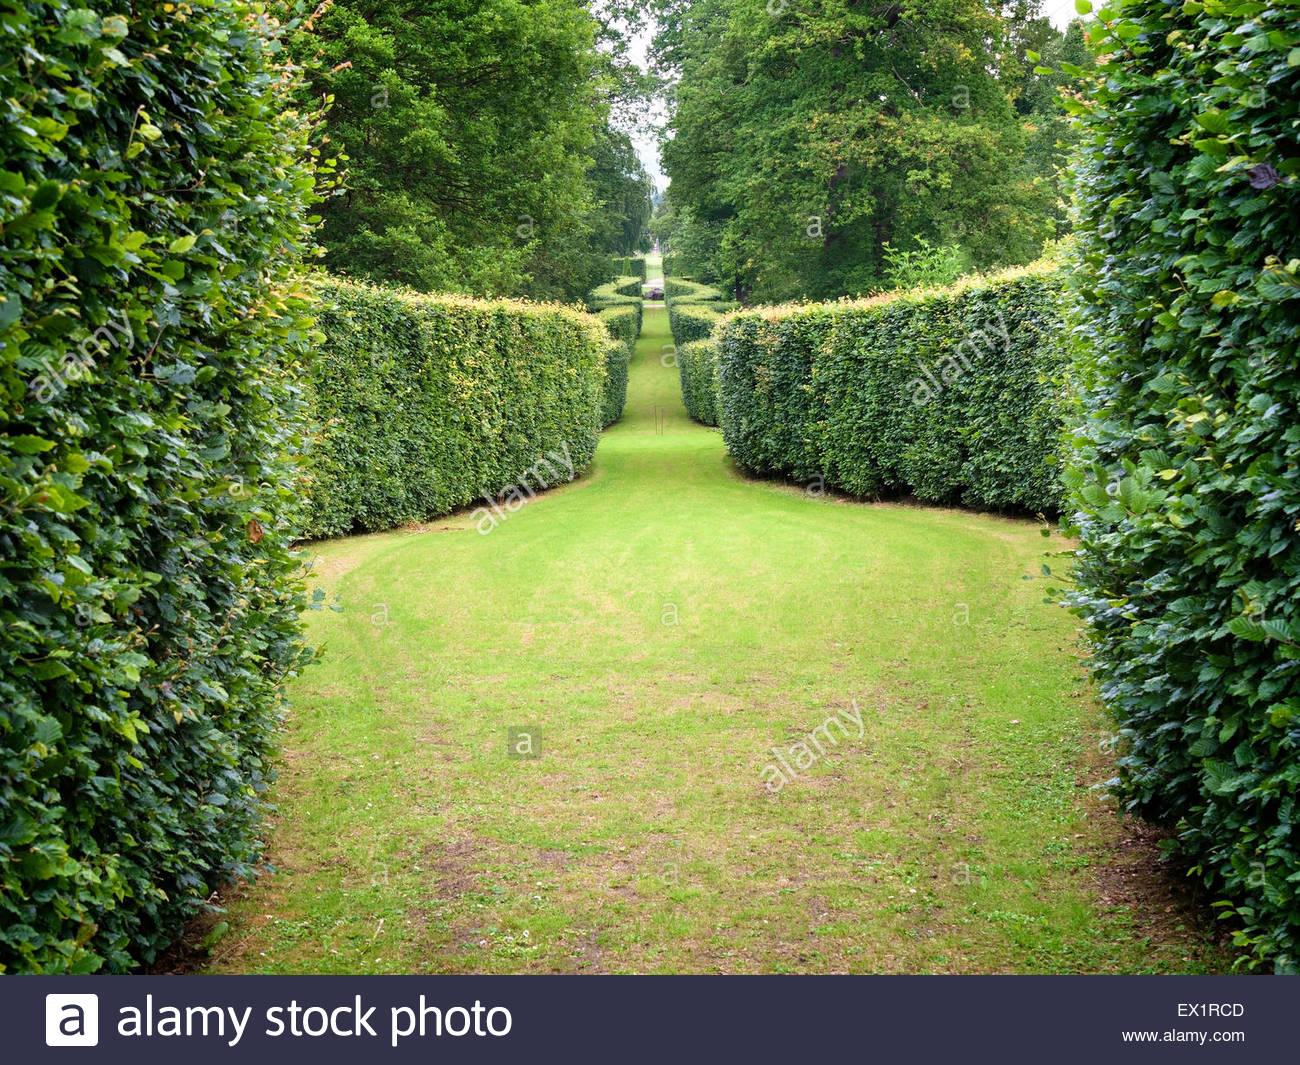 Serpentine beech hedge, Chatsworth garden, Derbyshire, England, UK - Stock Image